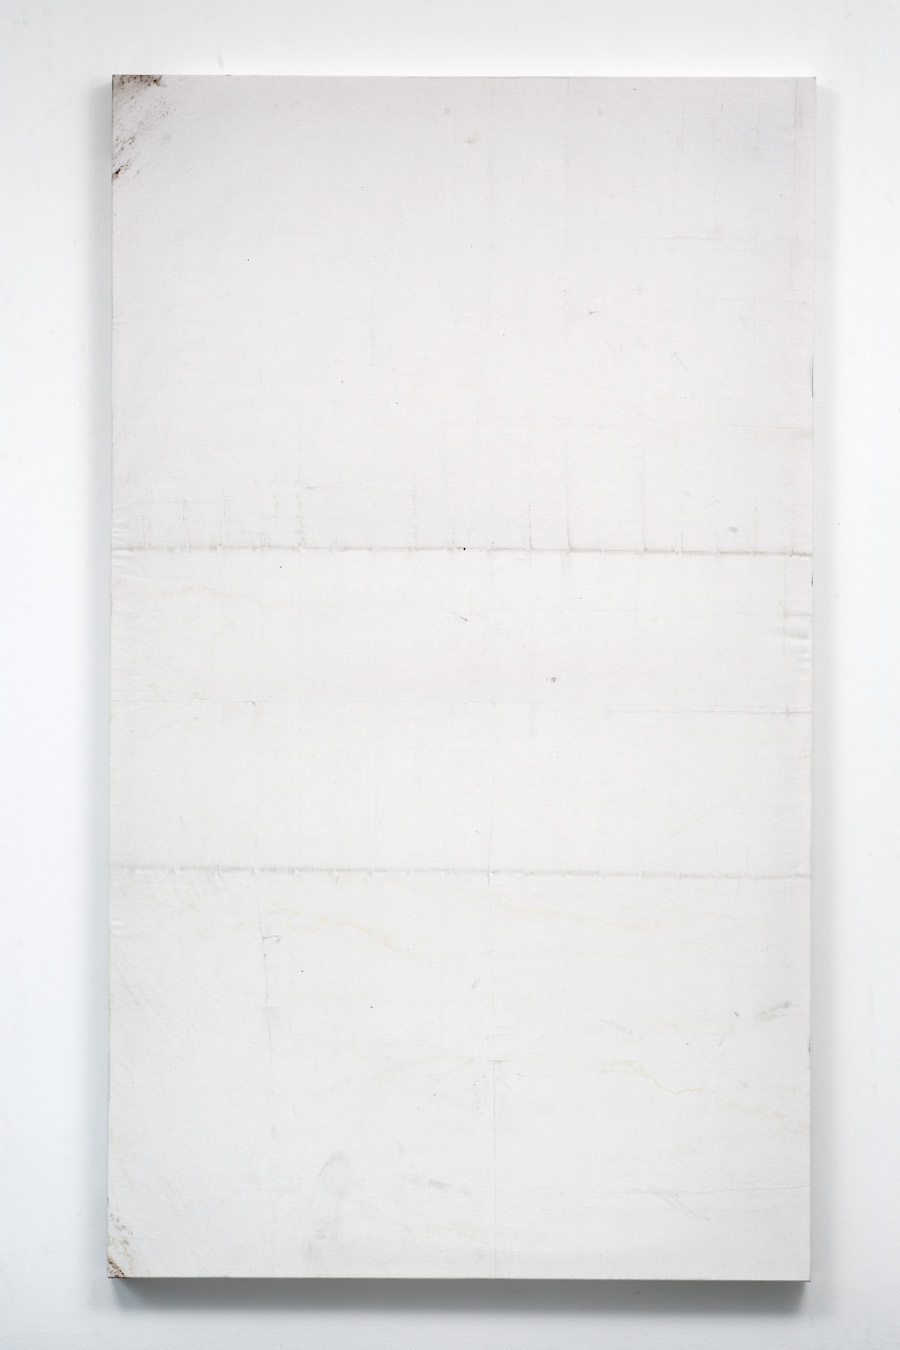 LV Rosa Luxemburg Str. 243x142cm